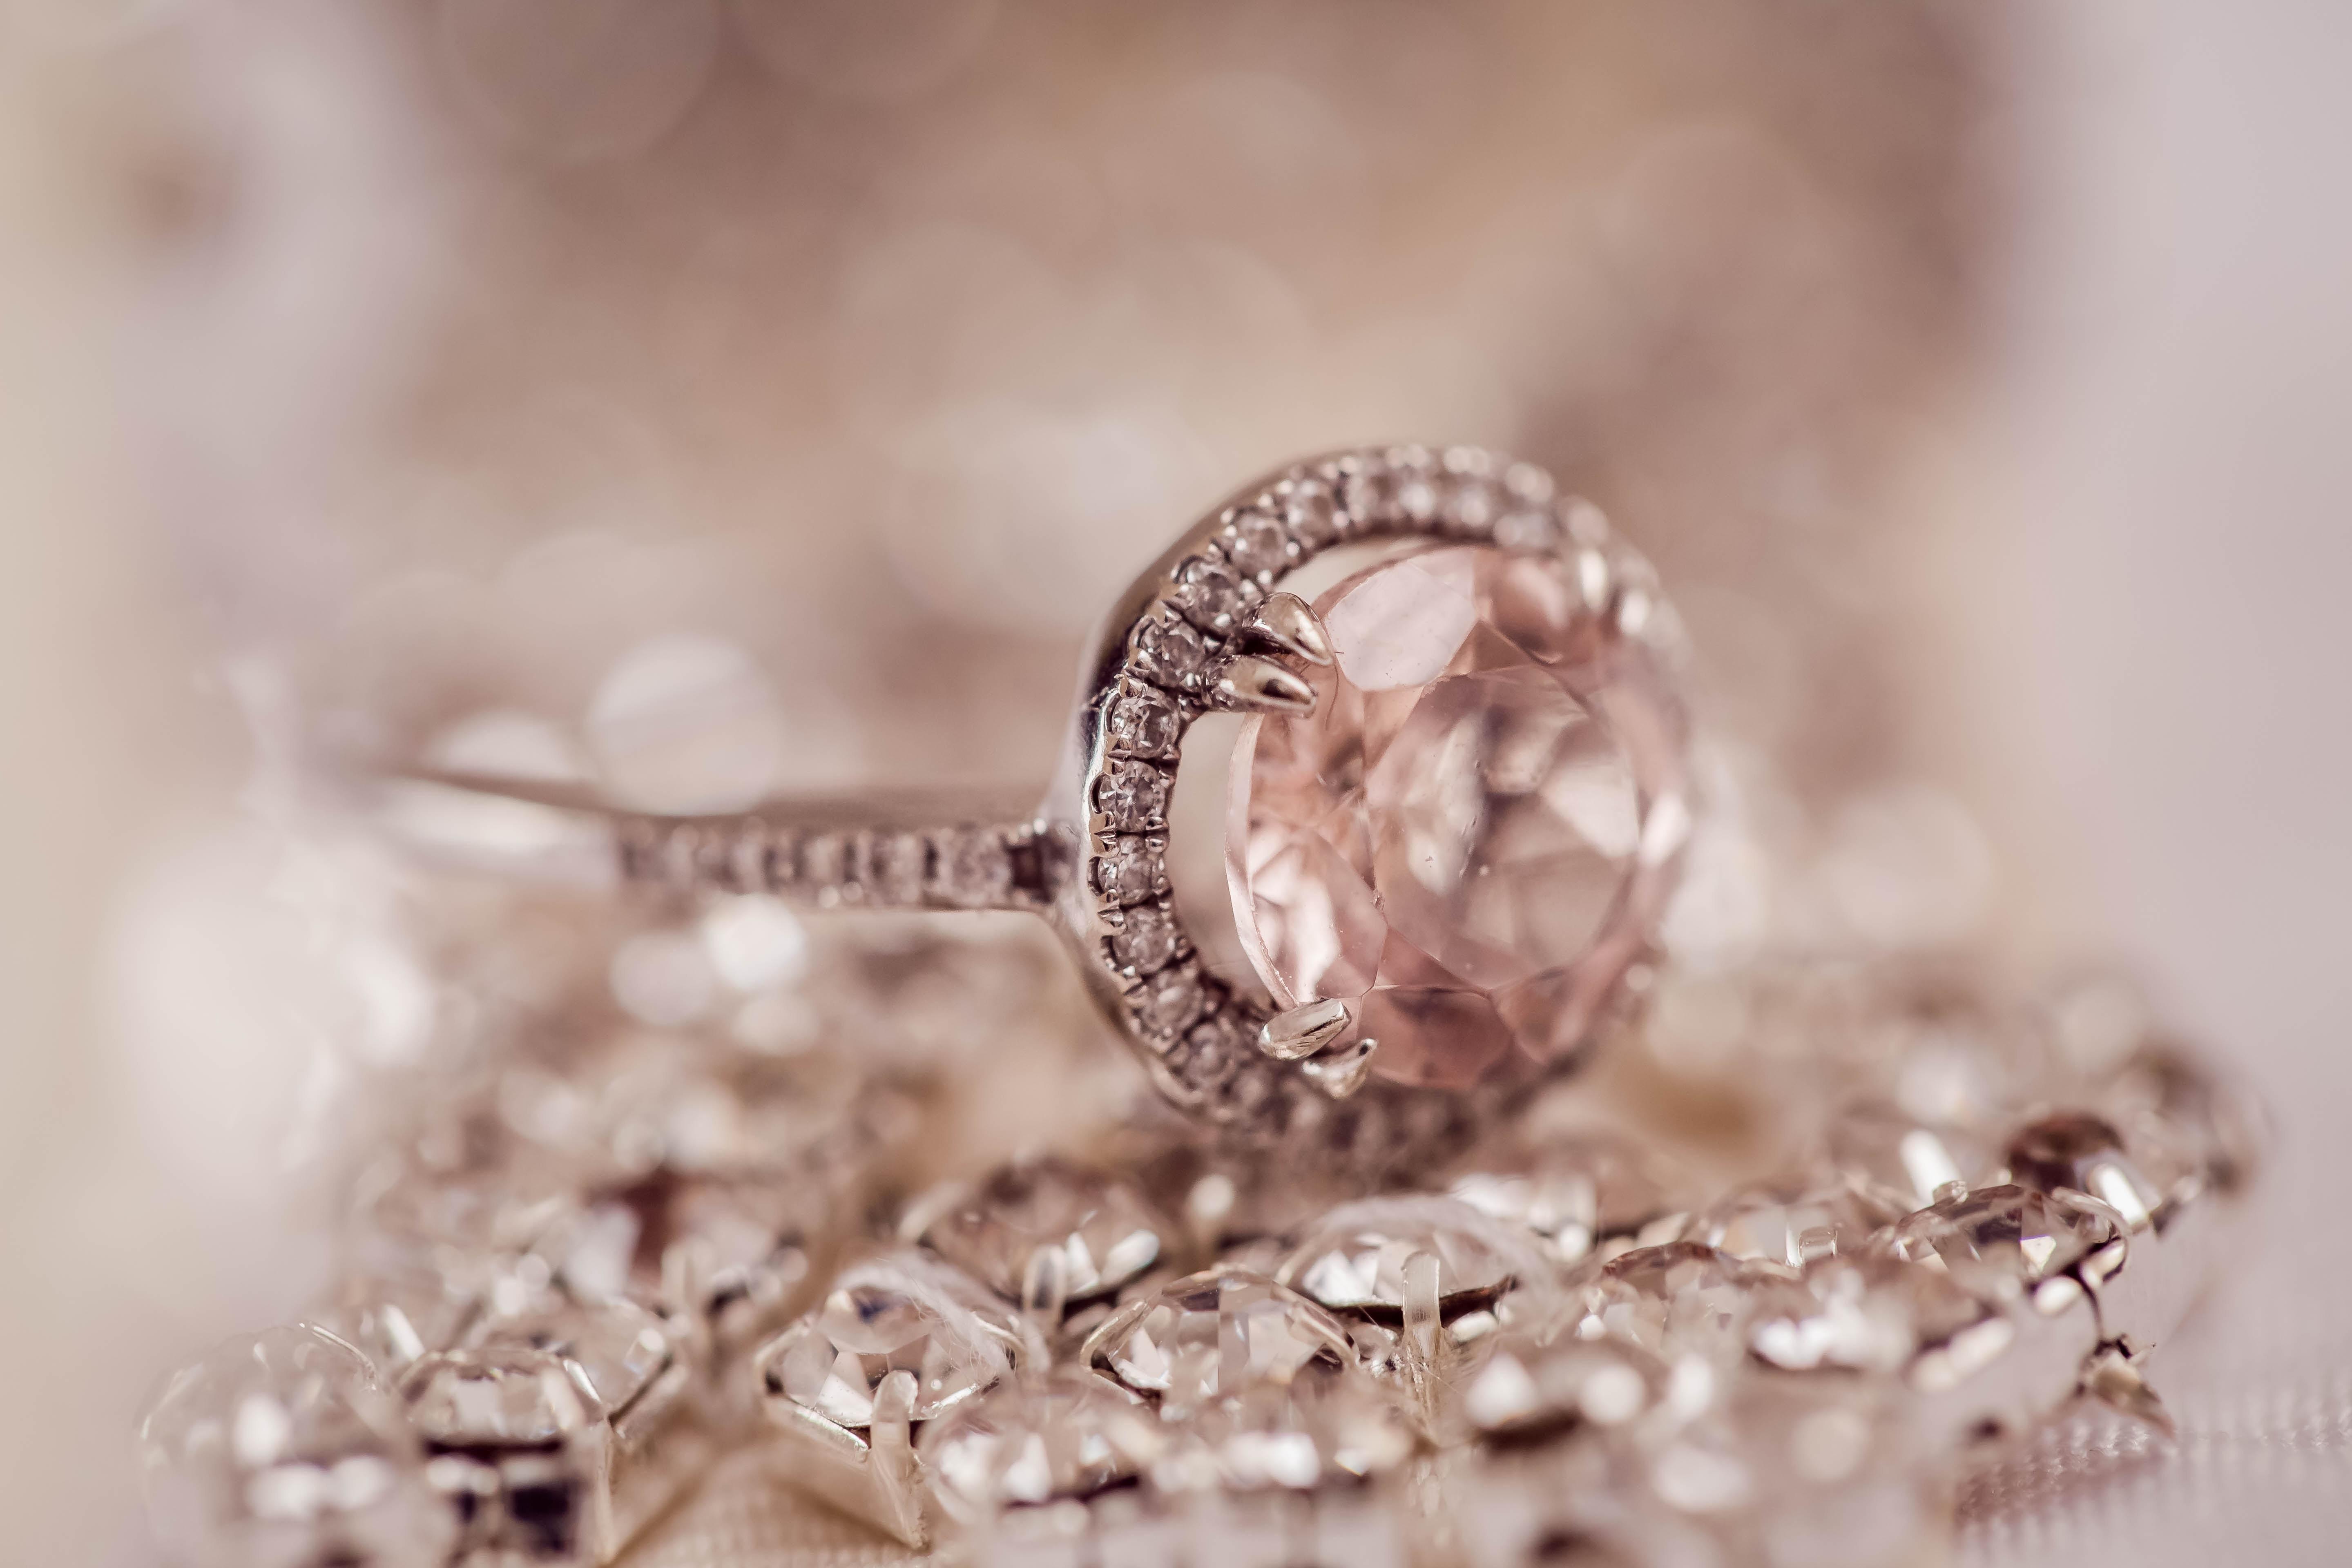 Crafting & Cocktails: Repurpose your broken jewelry. Crafting & Cocktails: Repurpose your broken jewelry